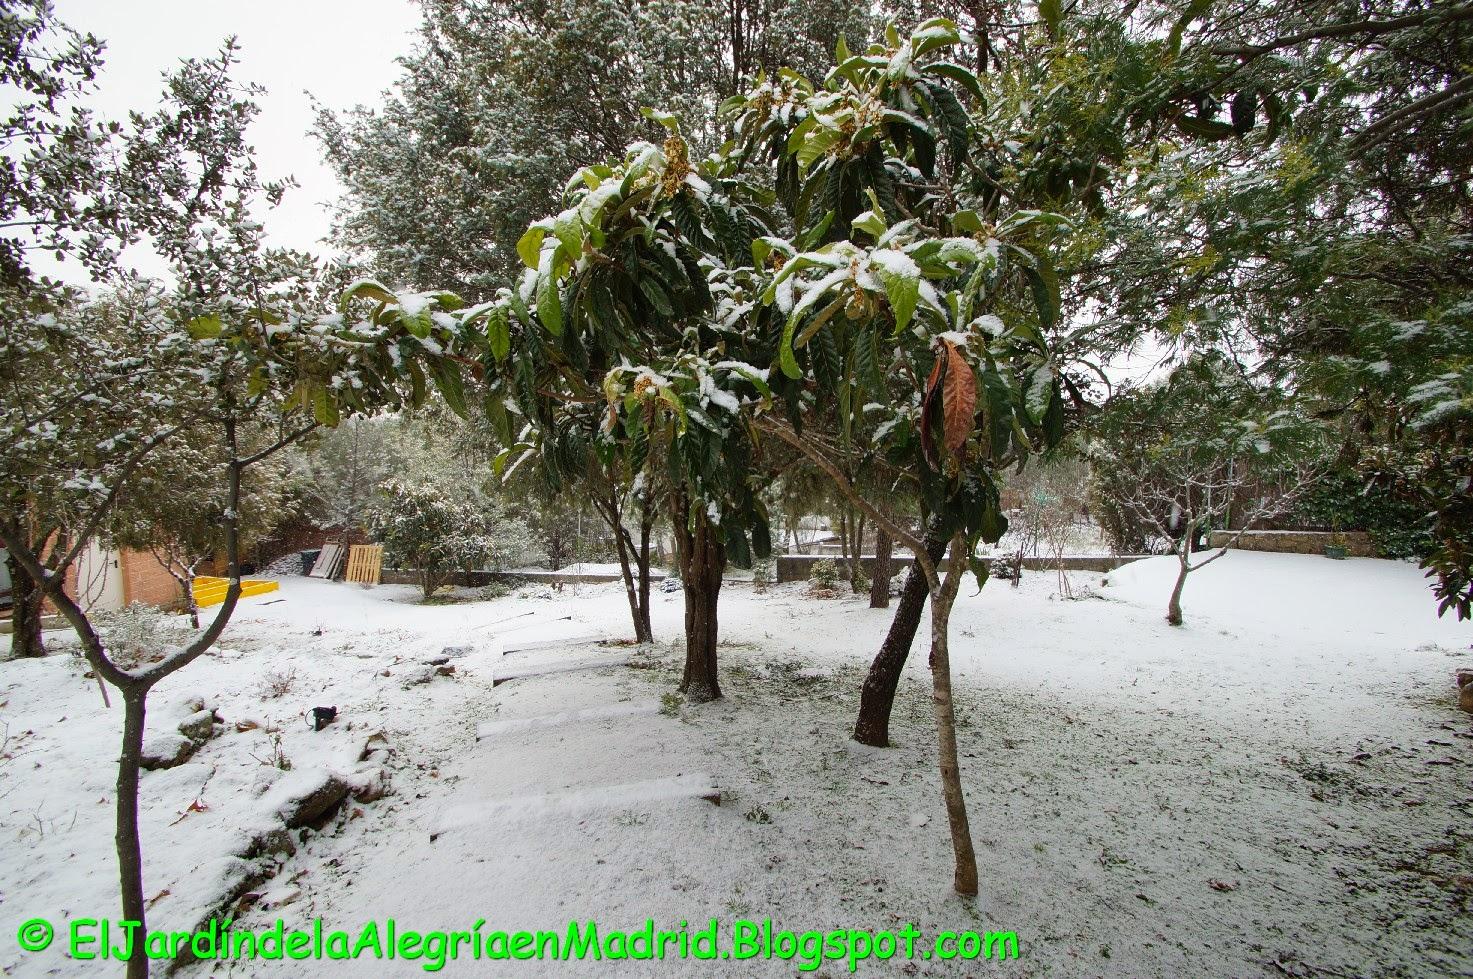 El jard n de la alegr a mi jard n sigue nevado for El jardin de la alegria cordoba